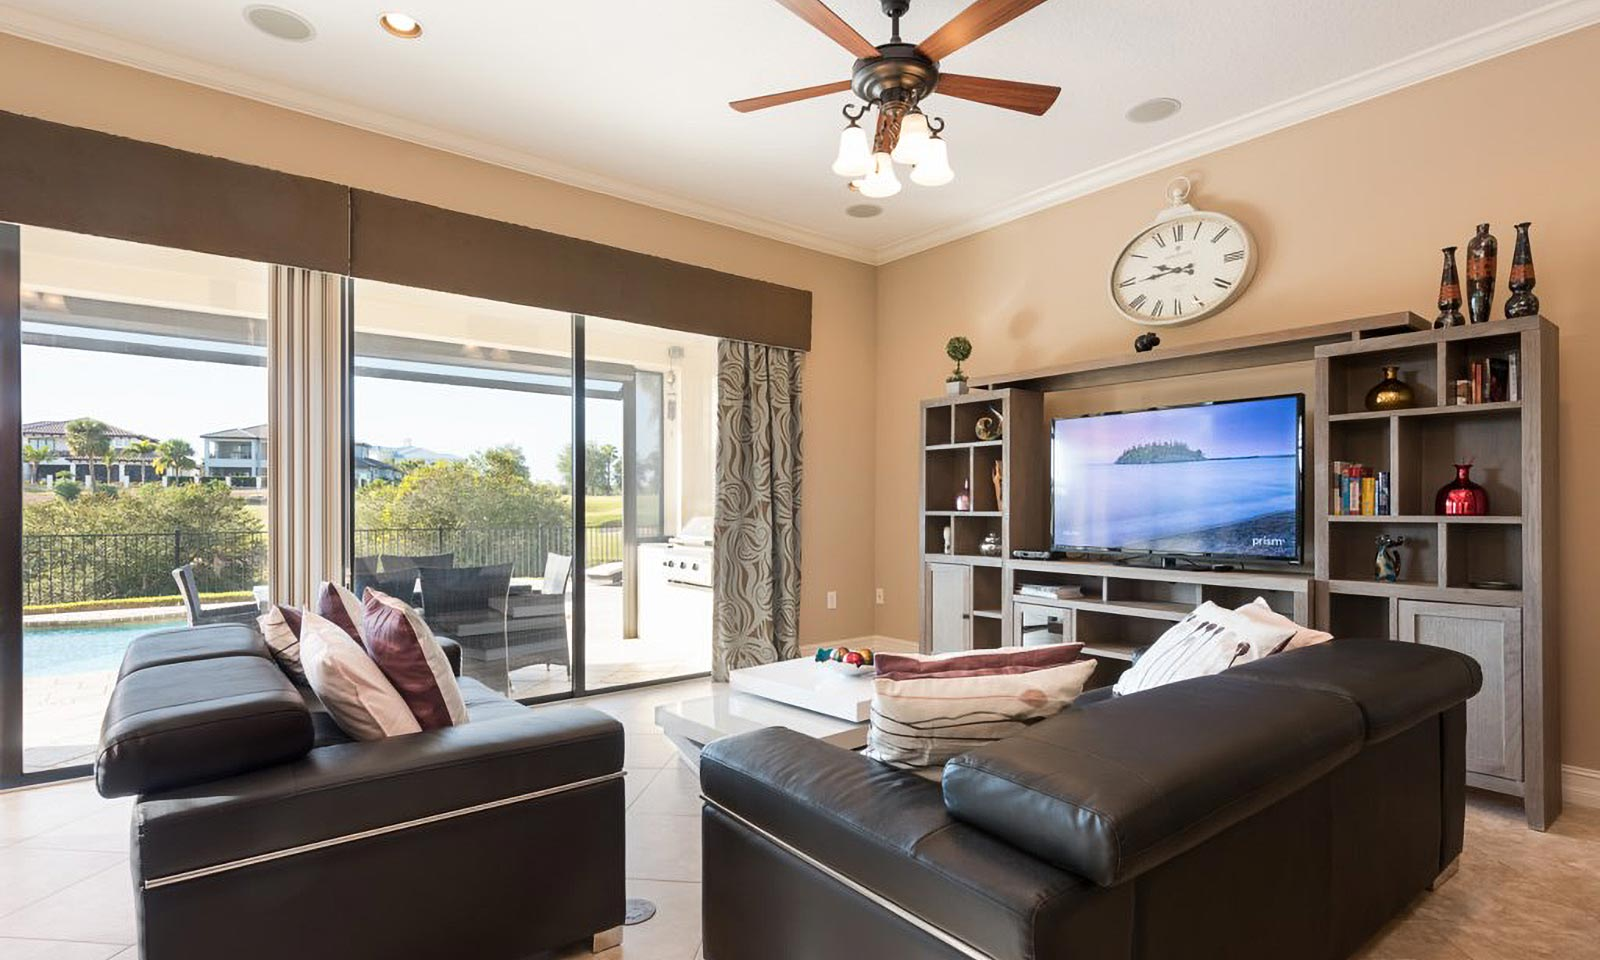 [amenities:Living-Room:1] Living Room